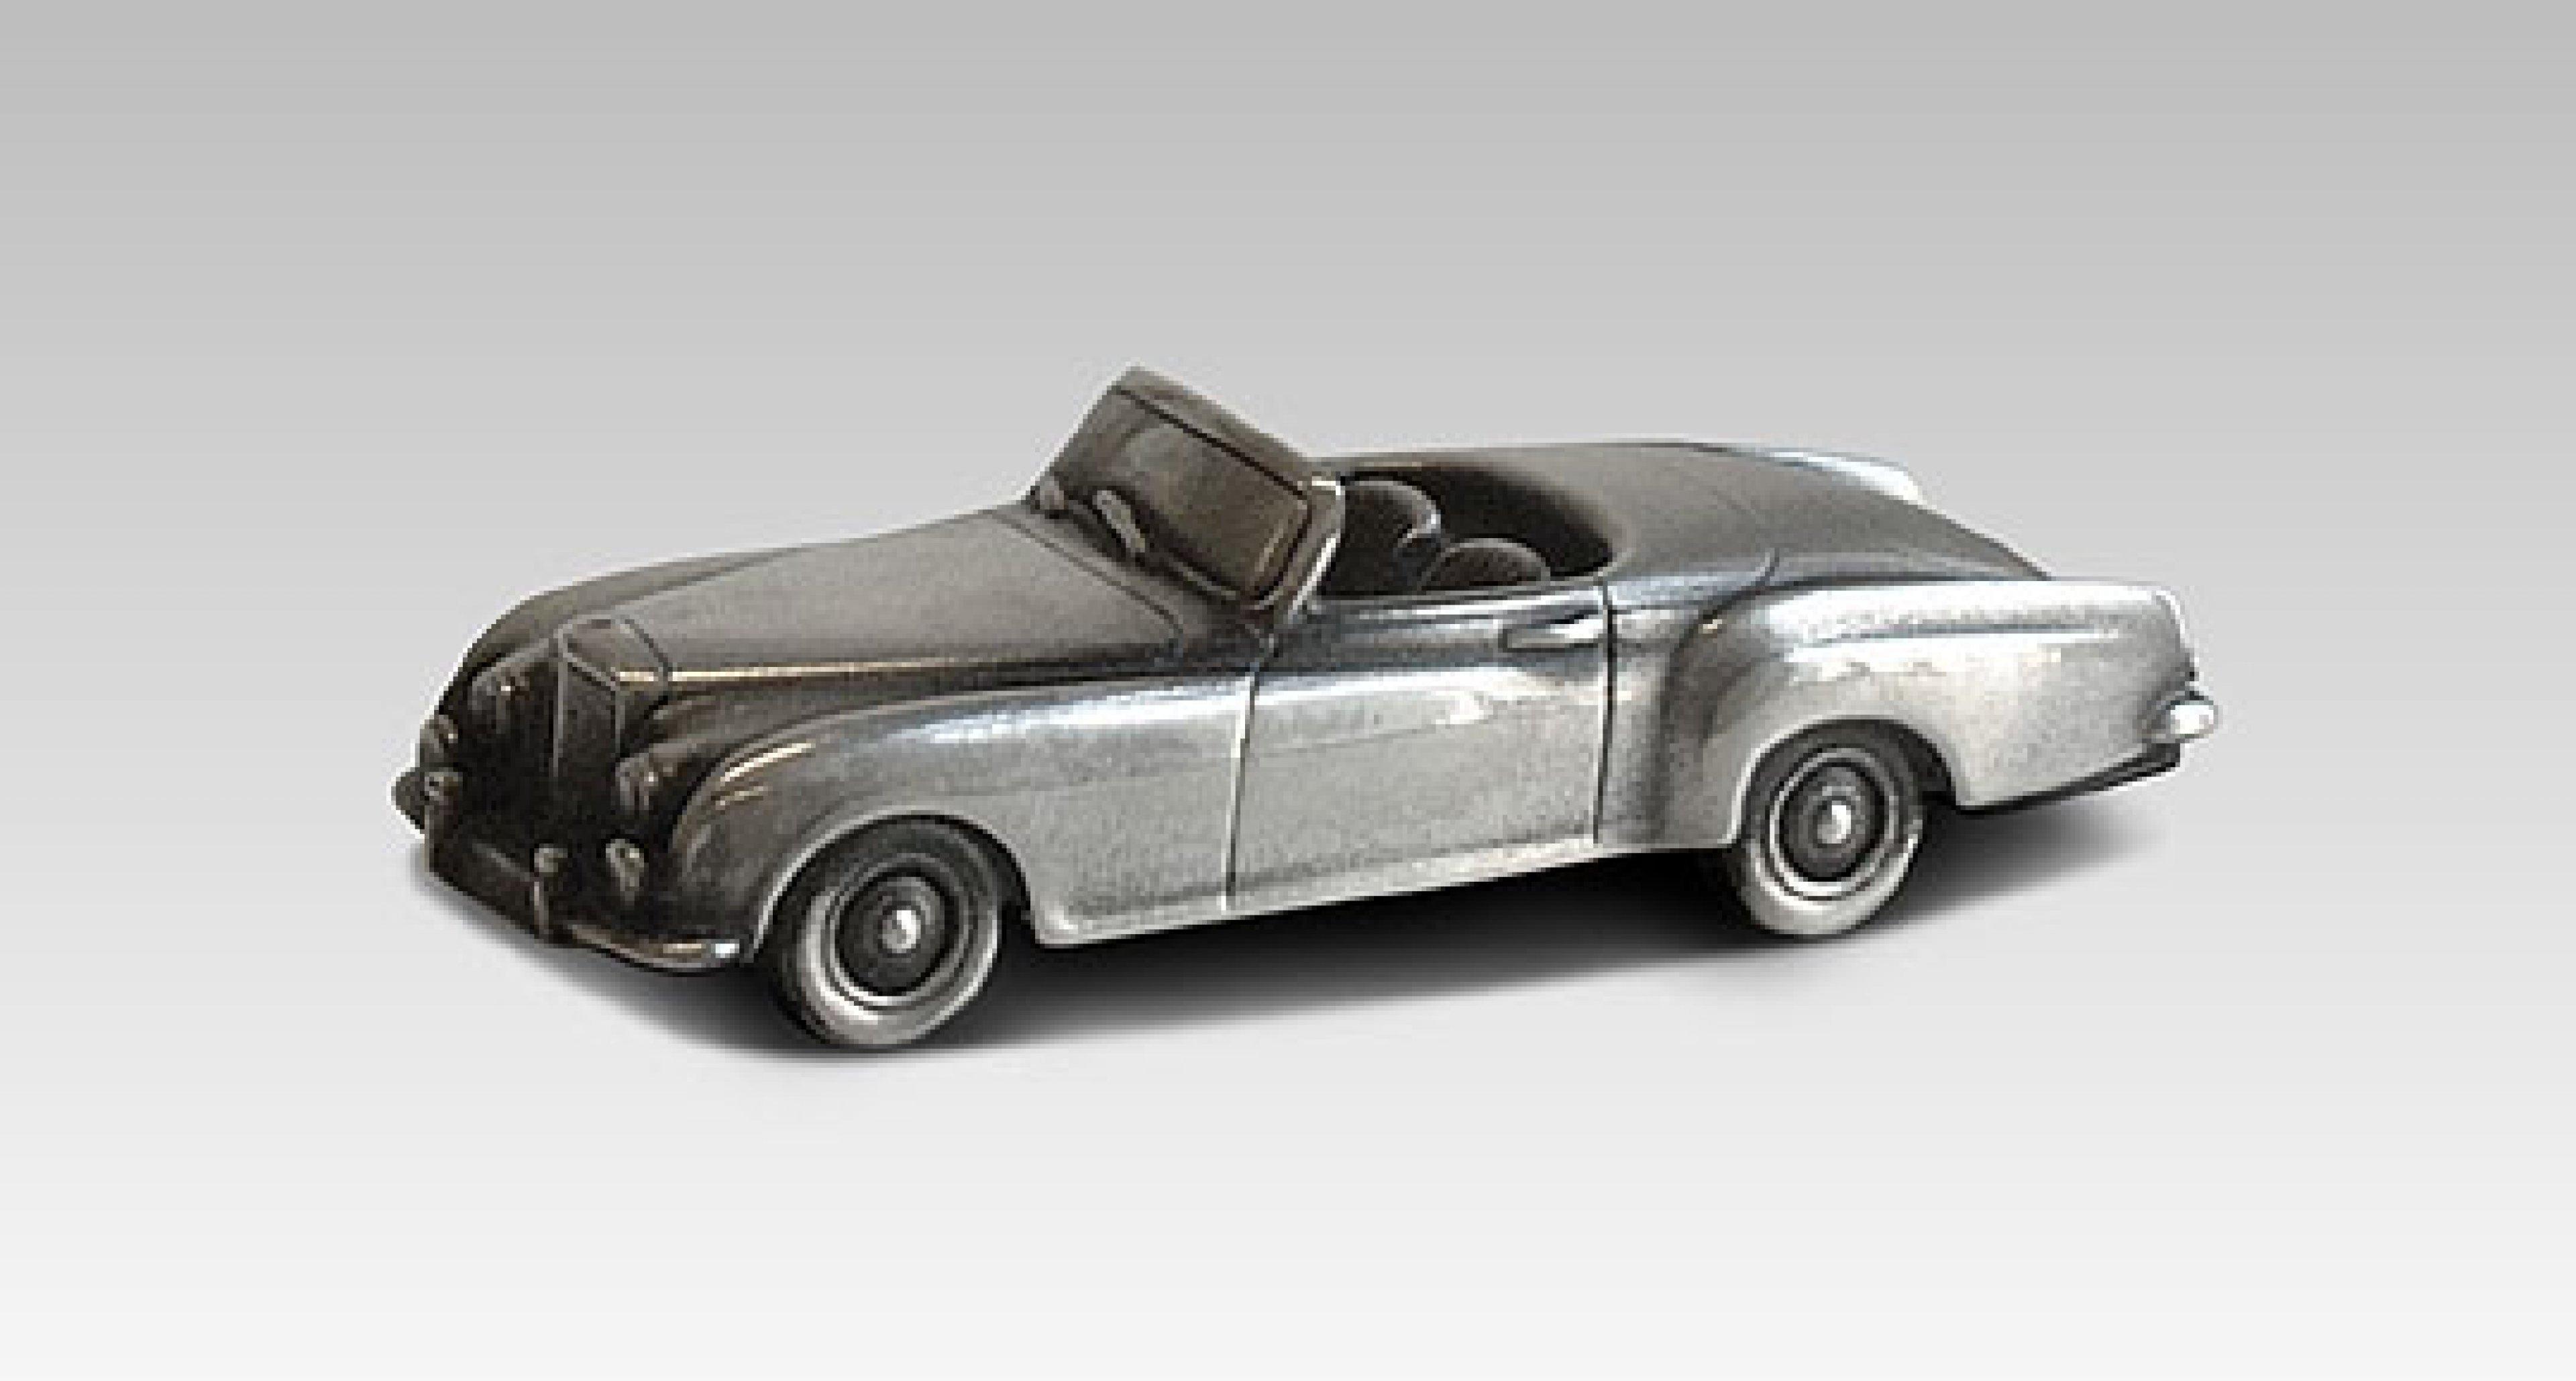 Bond was a Bentley Man